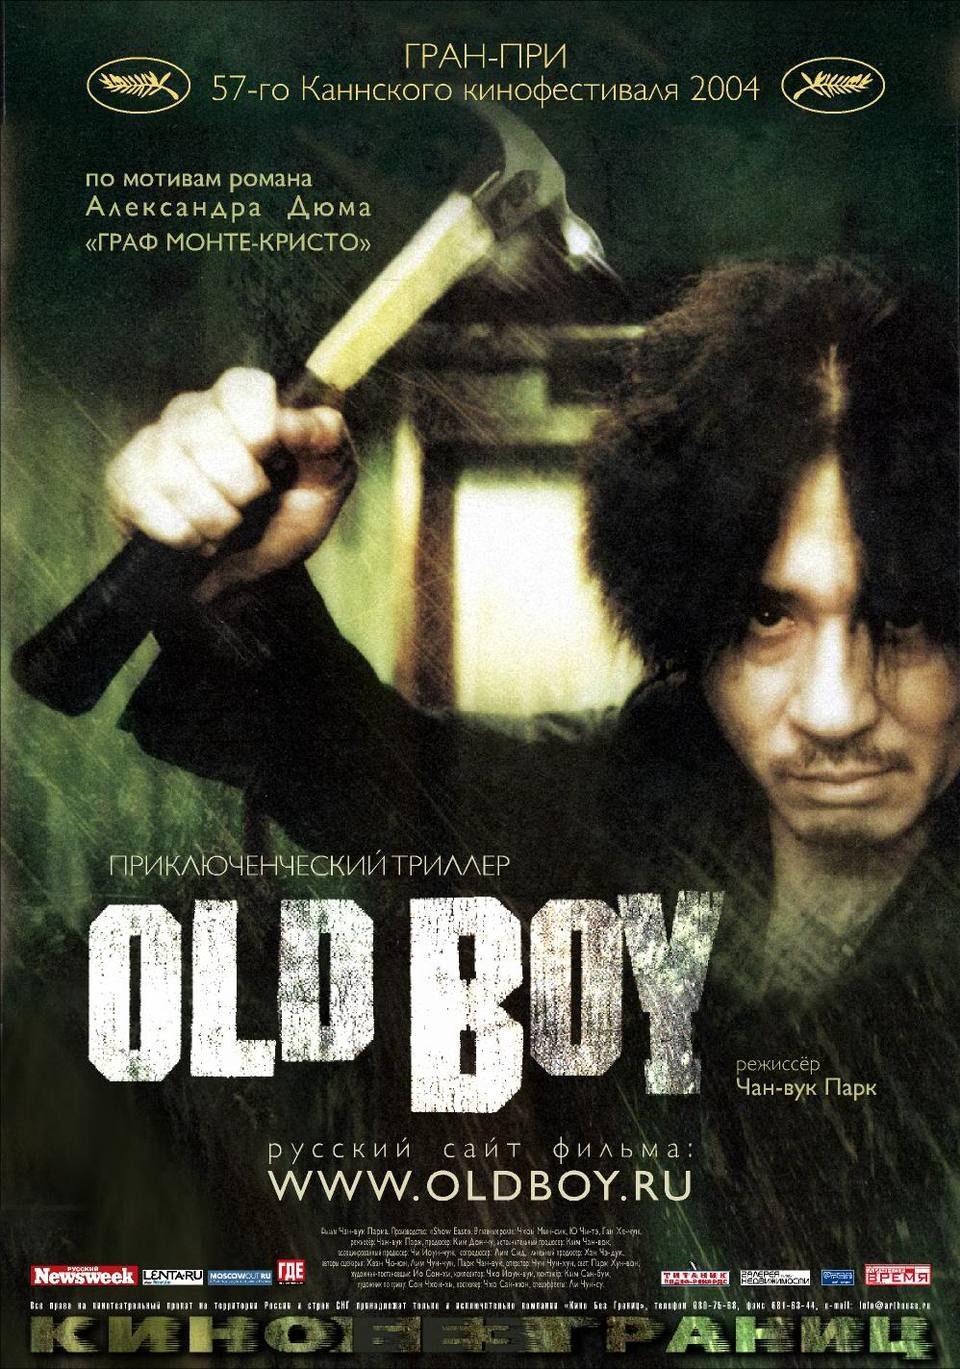 Estados Unidos poster for Oldboy